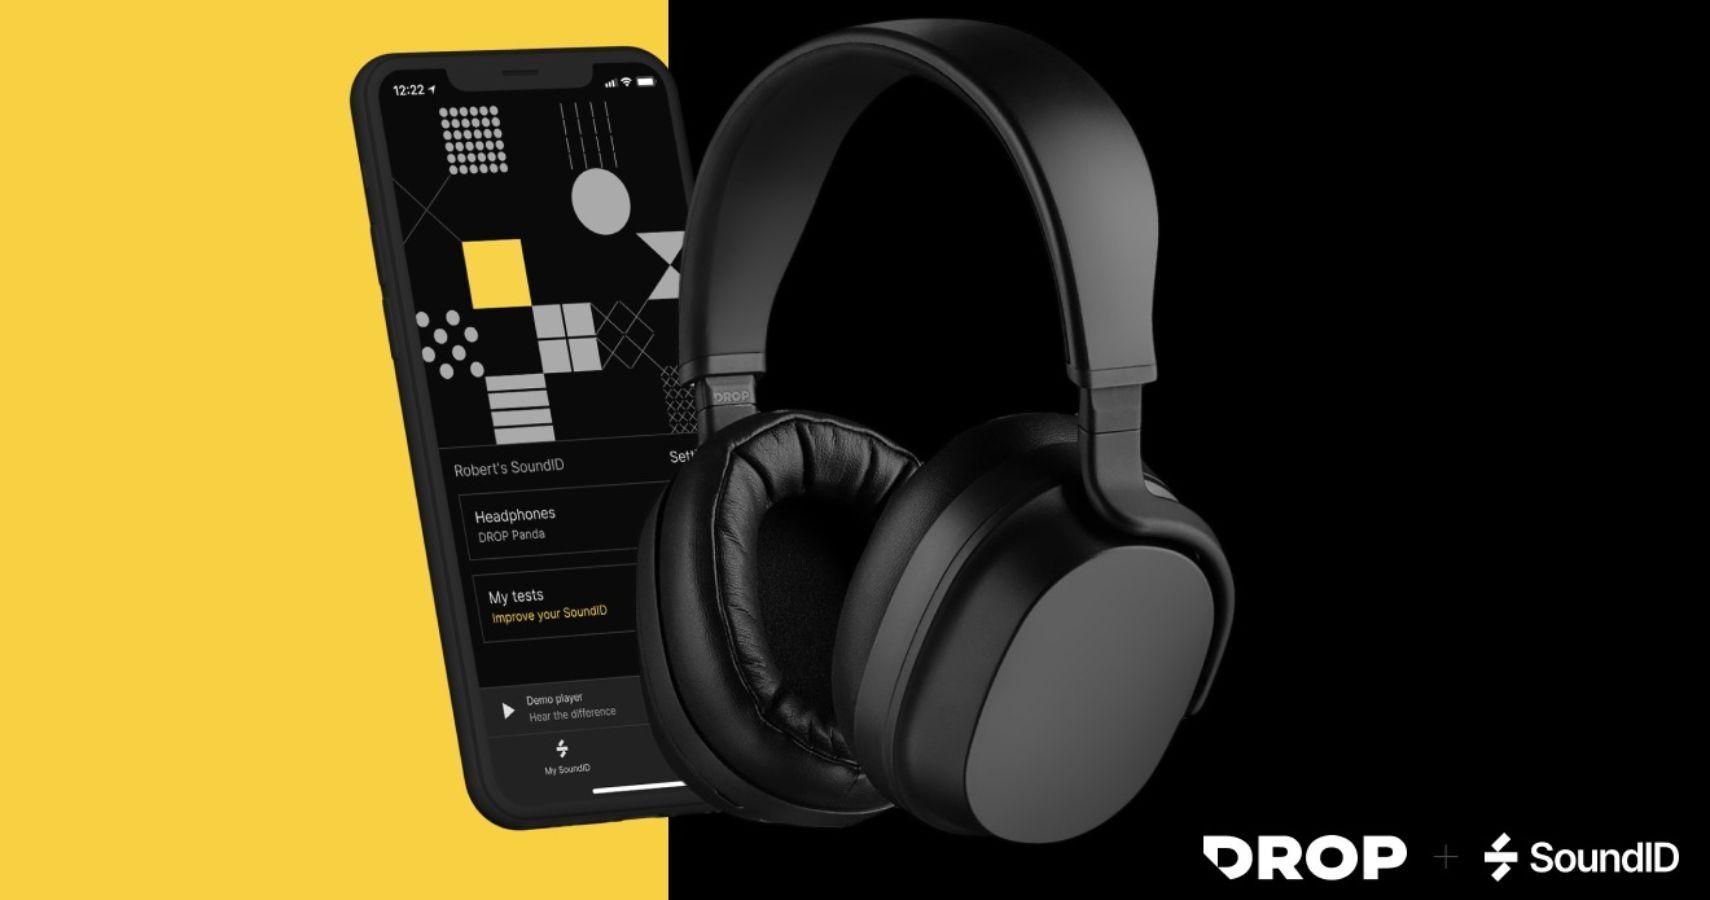 Drop + THX Panda Wireless Headphones Now Support SoundID